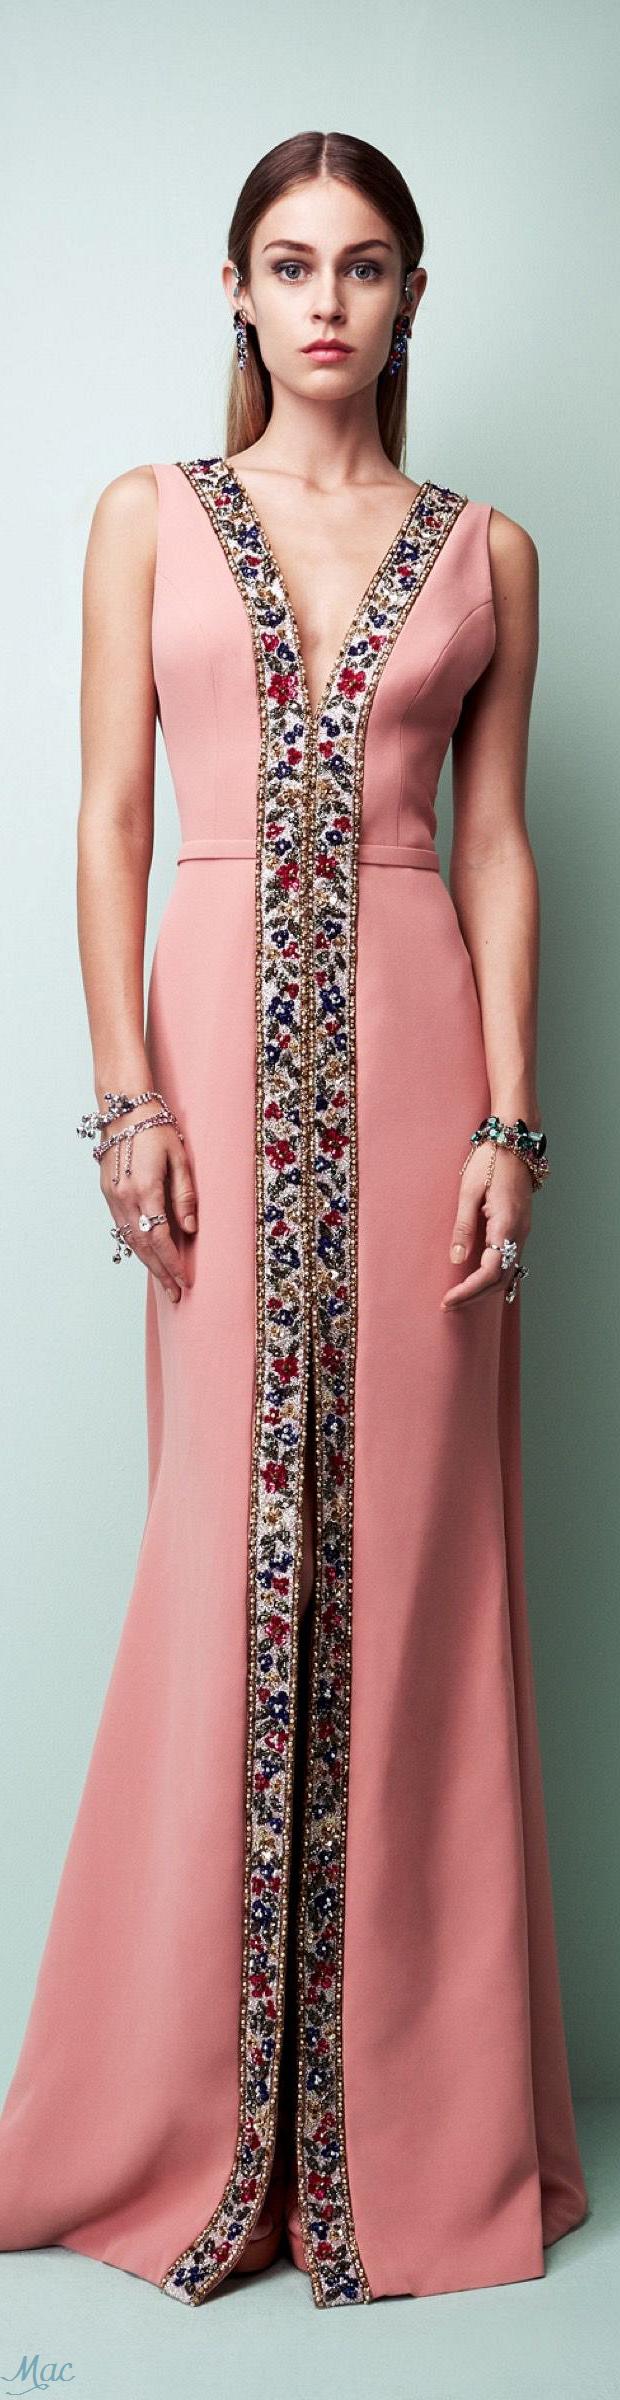 Spring 2017 Ready-to-Wear Georges Hobeika | moda | Pinterest ...